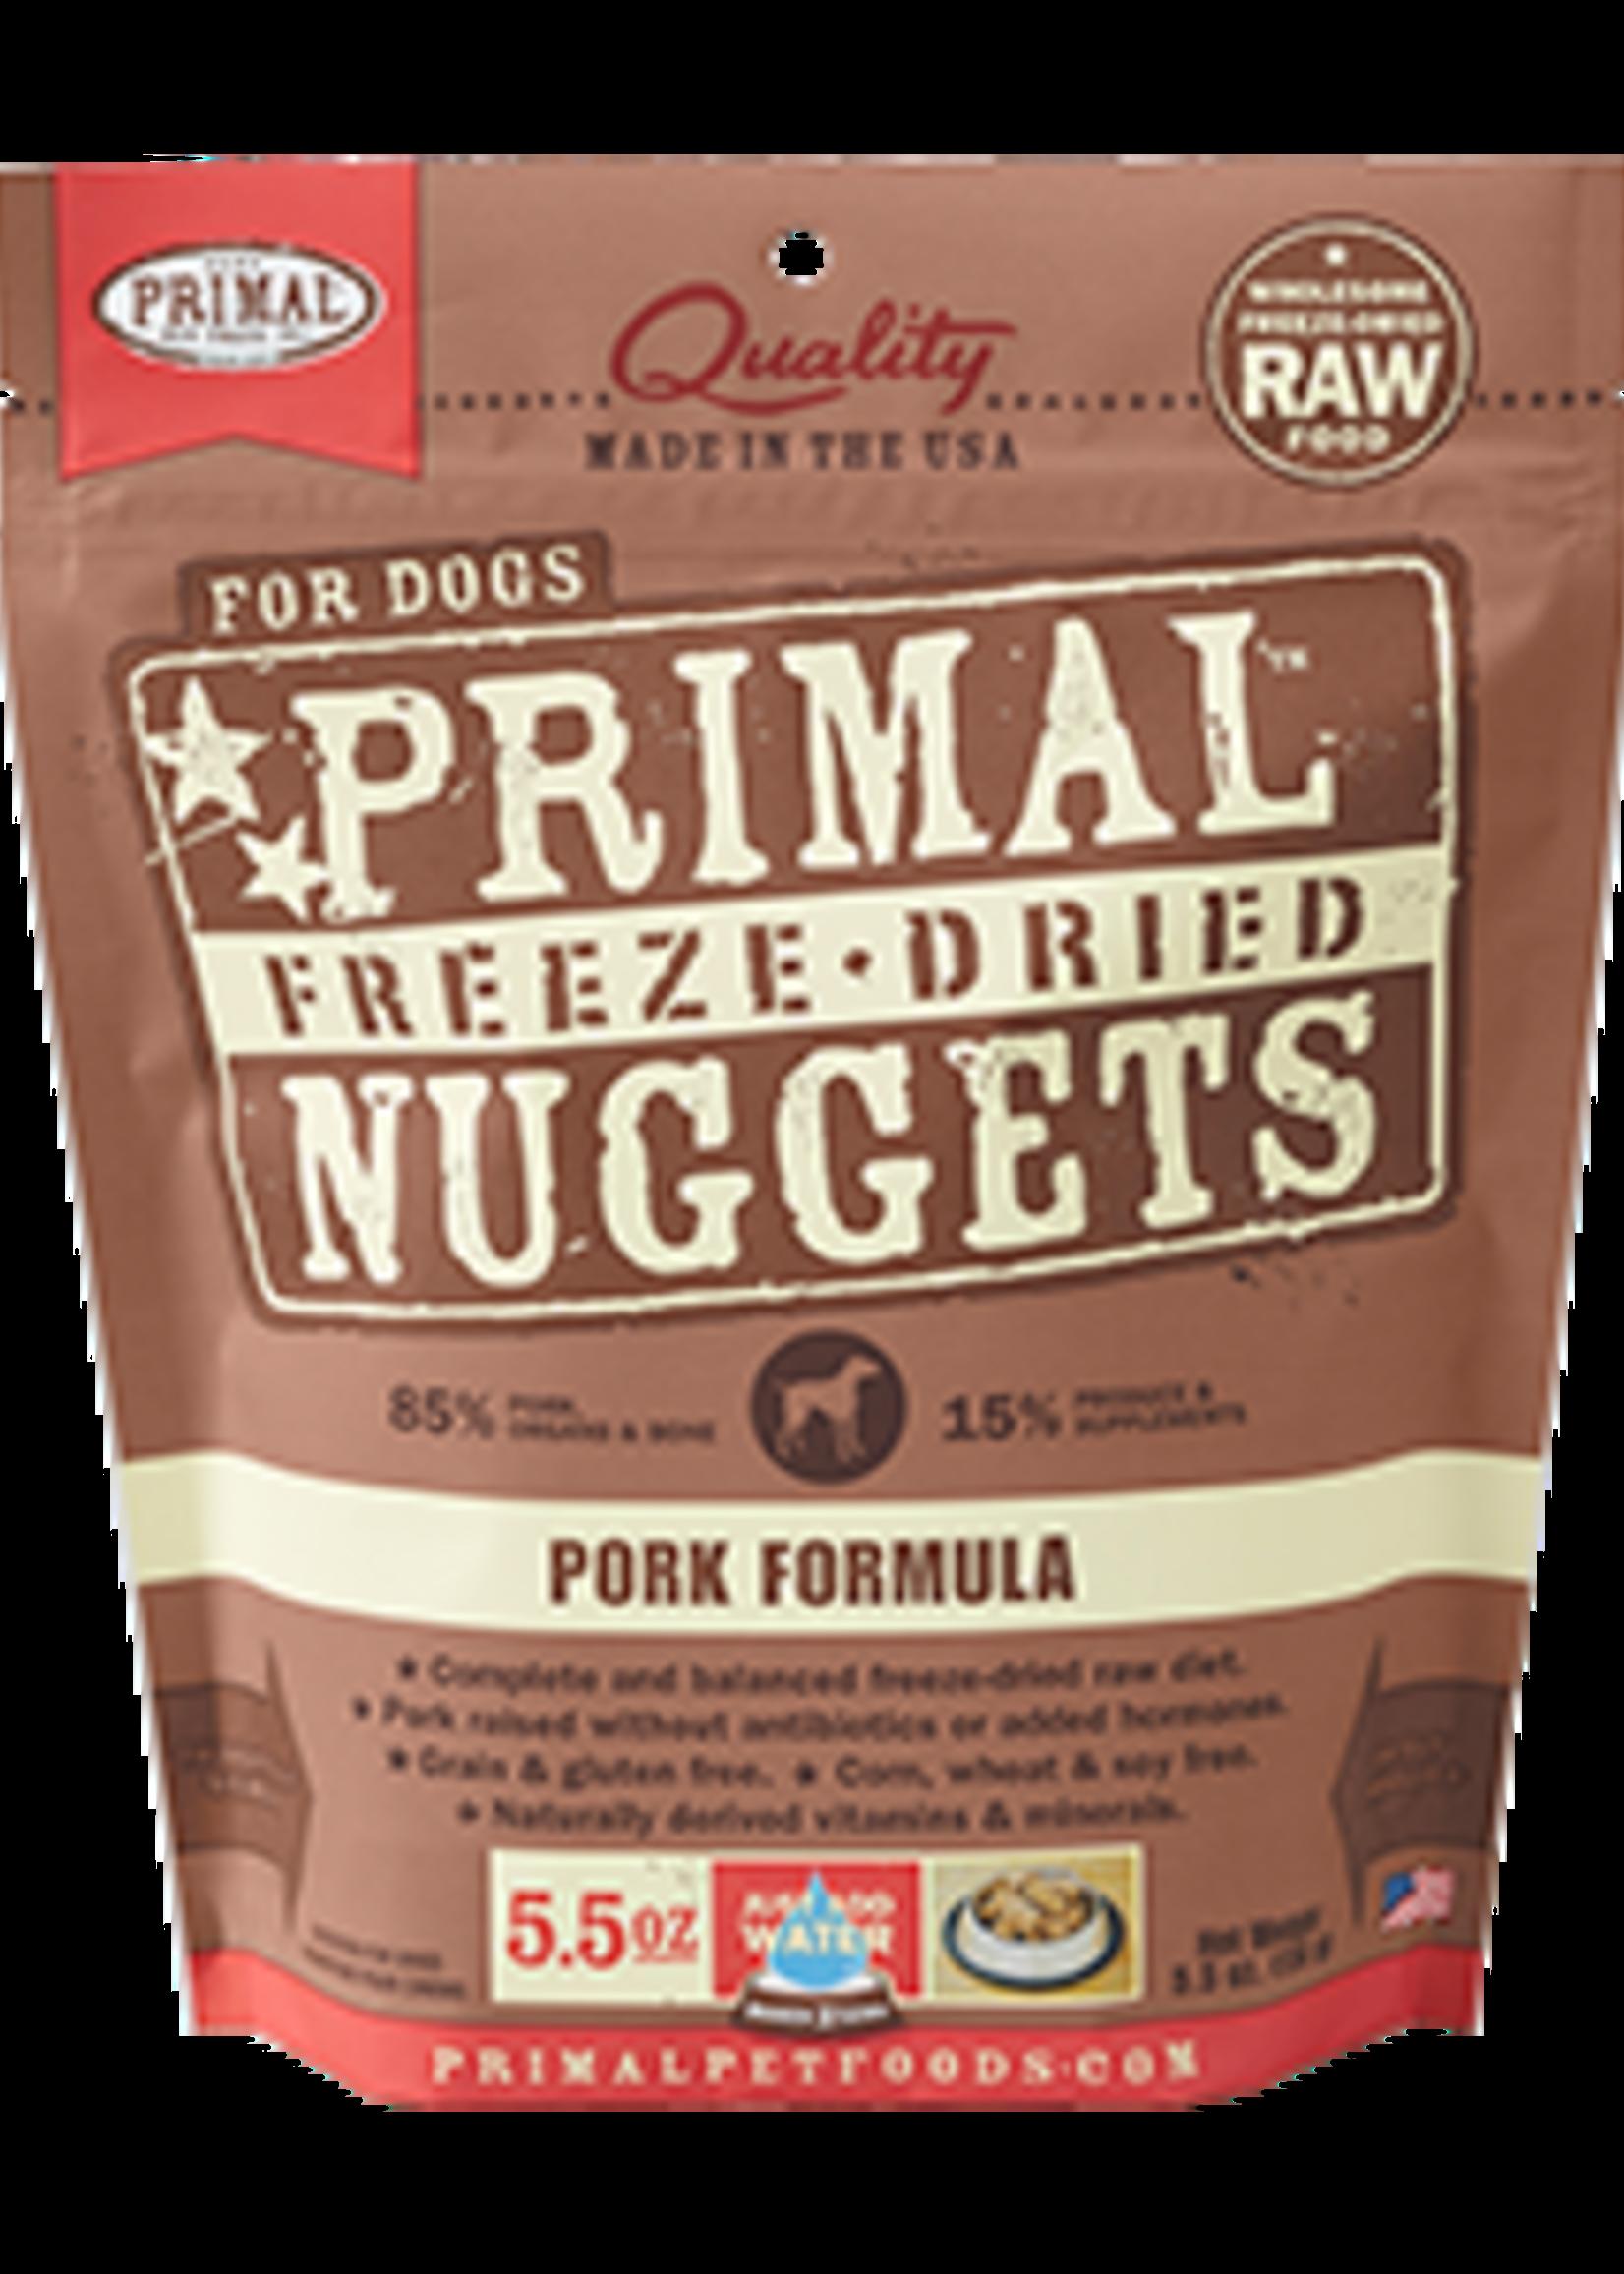 Primal Primal Dog Freeze Dried Pork  Nugget 14 oz.